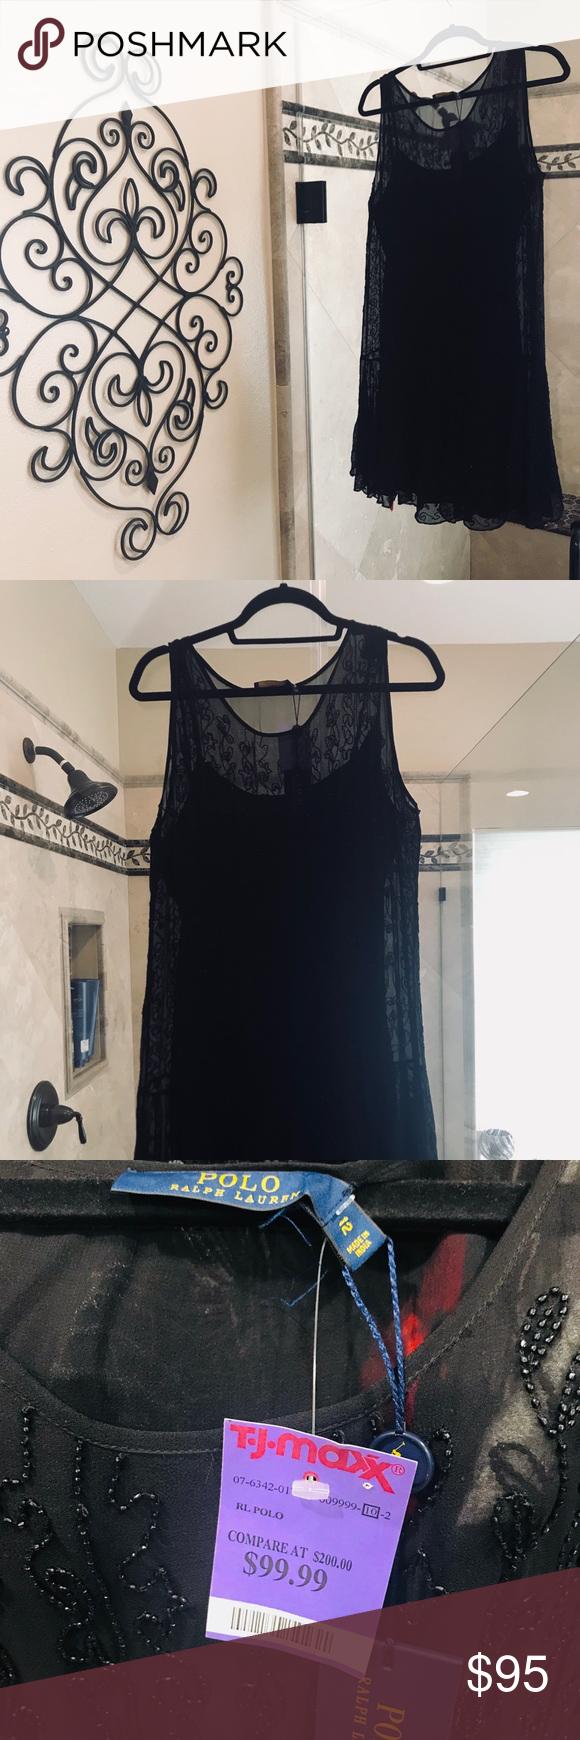 43b93d14f57f Ralph Lauren Sequin Layer Black Dress Brand new (TJ Maxx Purchase) Ralph  Lauren Sequin